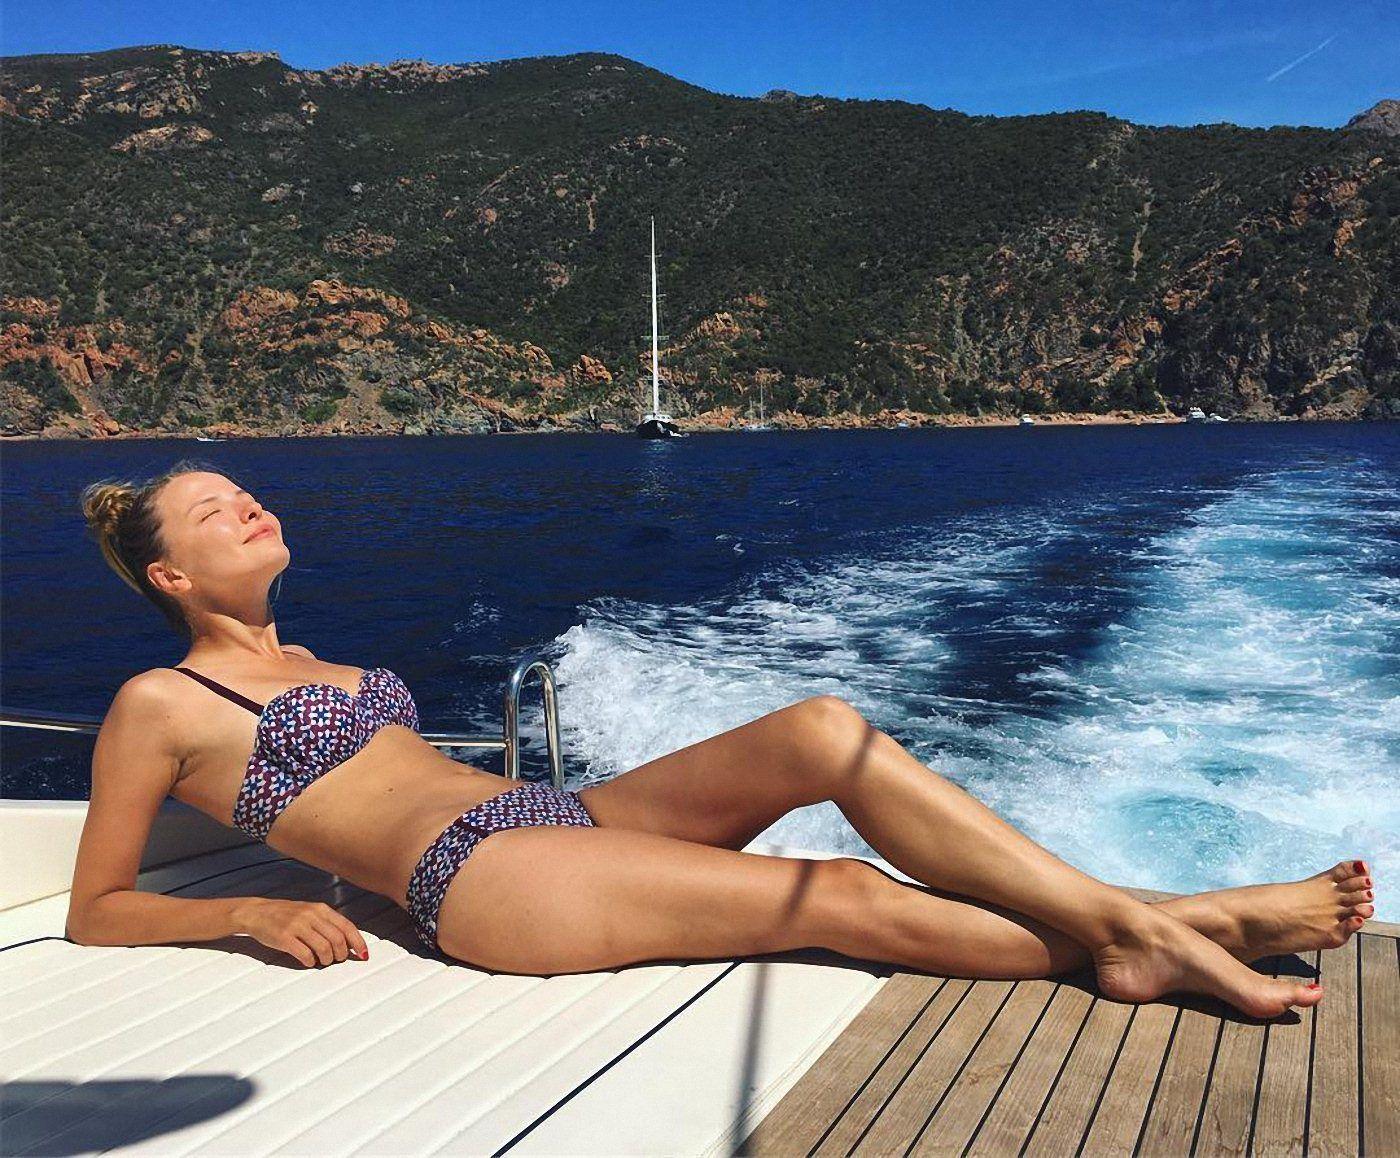 Bikini Marina Orlova nudes (53 photos), Tits, Paparazzi, Twitter, cleavage 2017